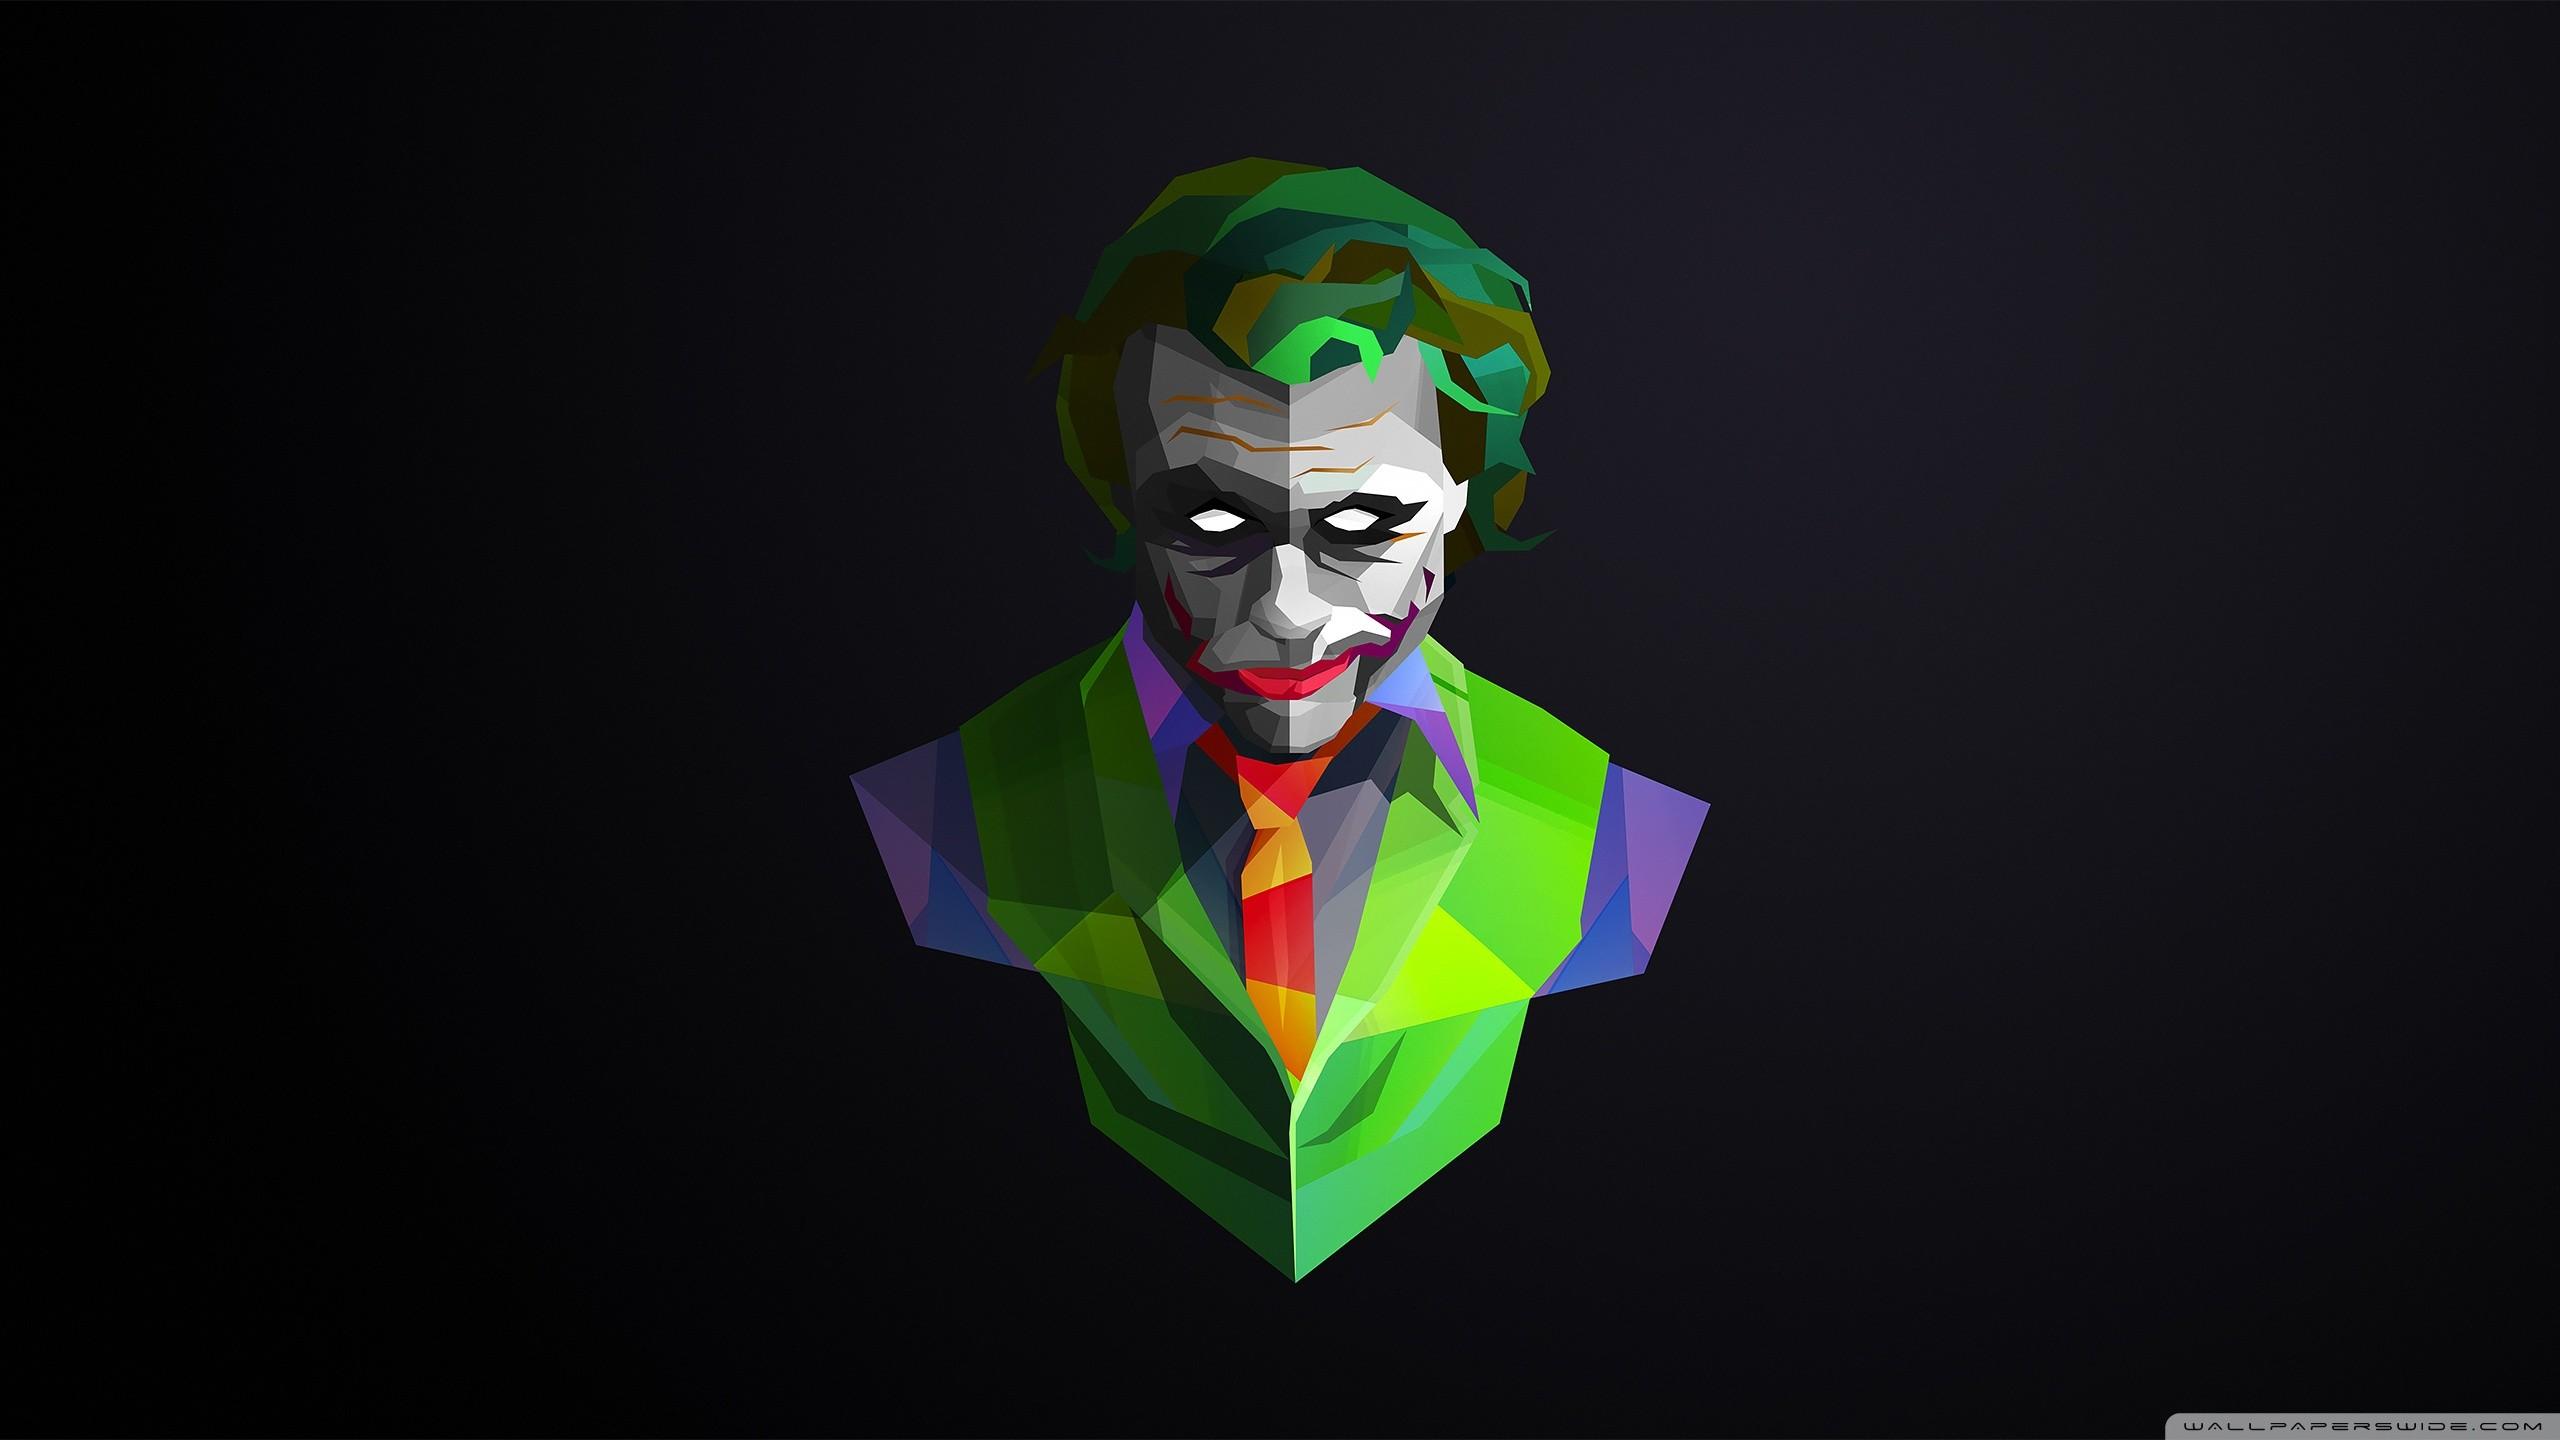 The Joker Desktop Background 1